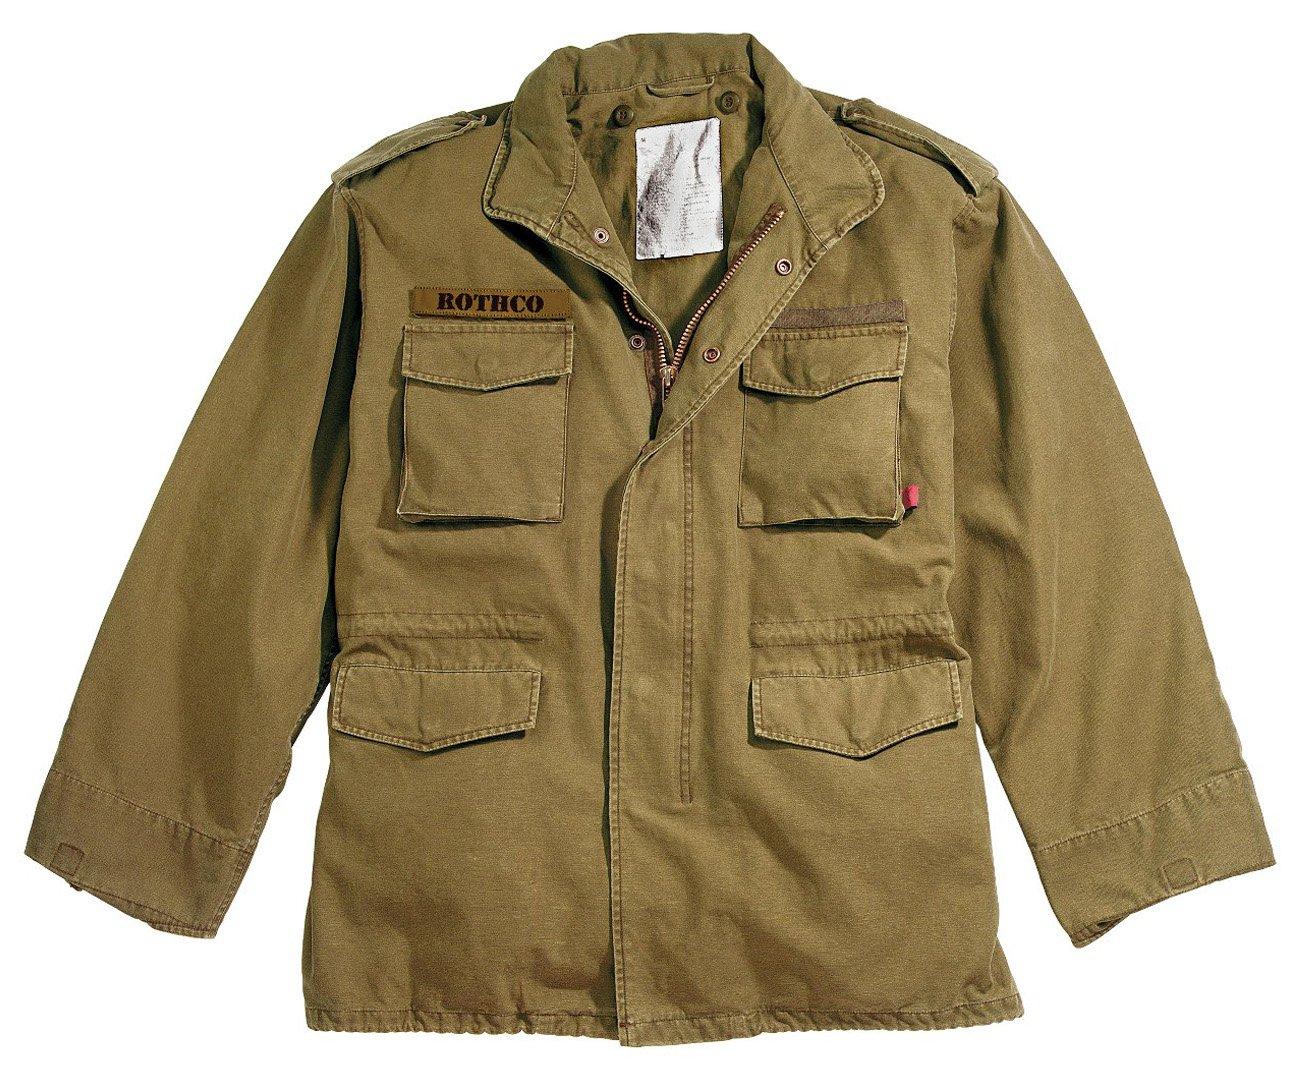 Rothco Vintage M-65 Field Jackets